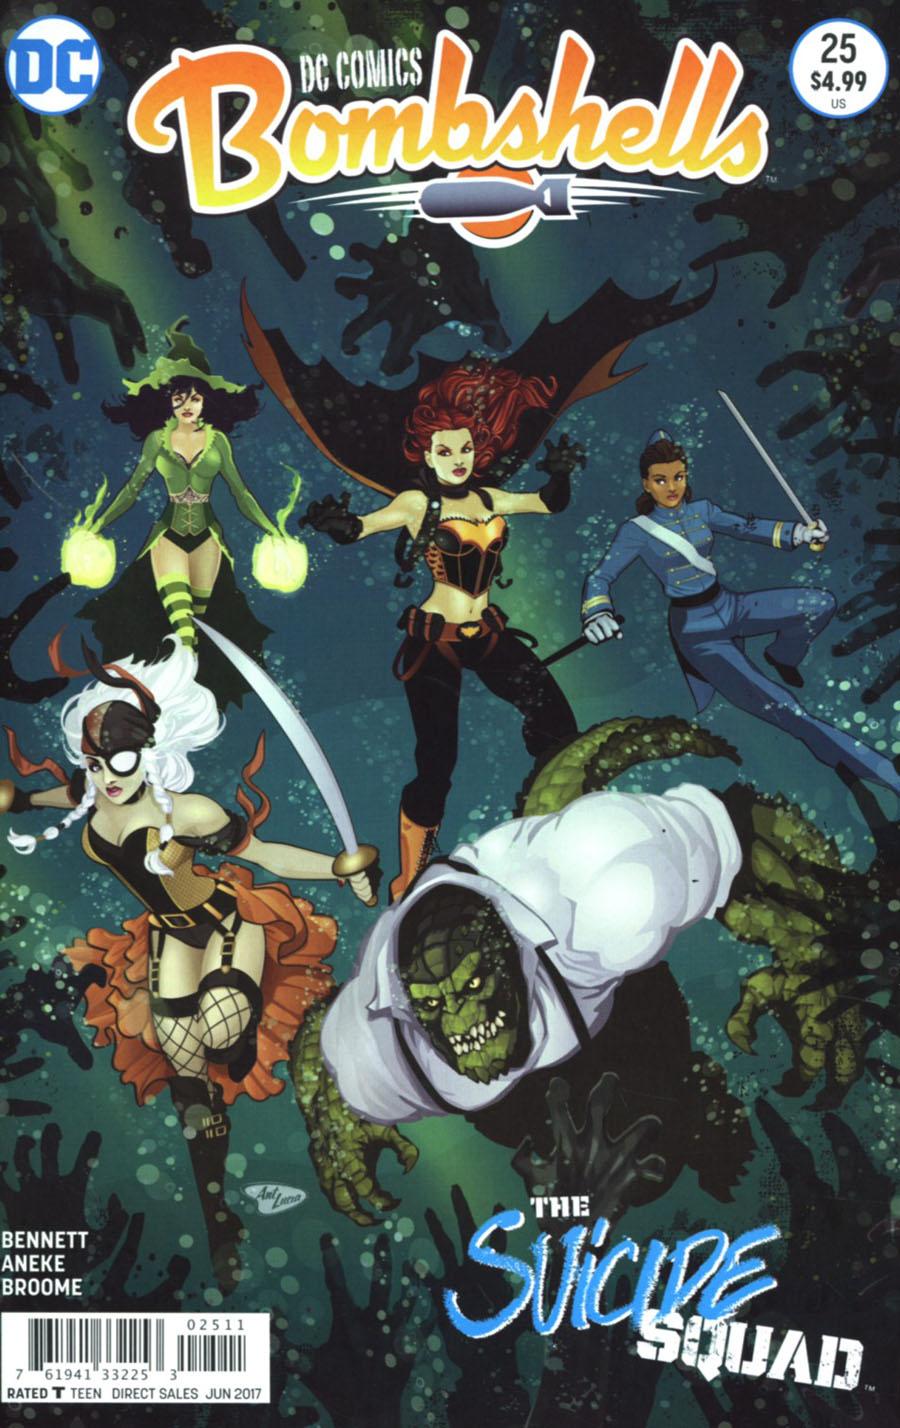 DC Comics Bombshells #25